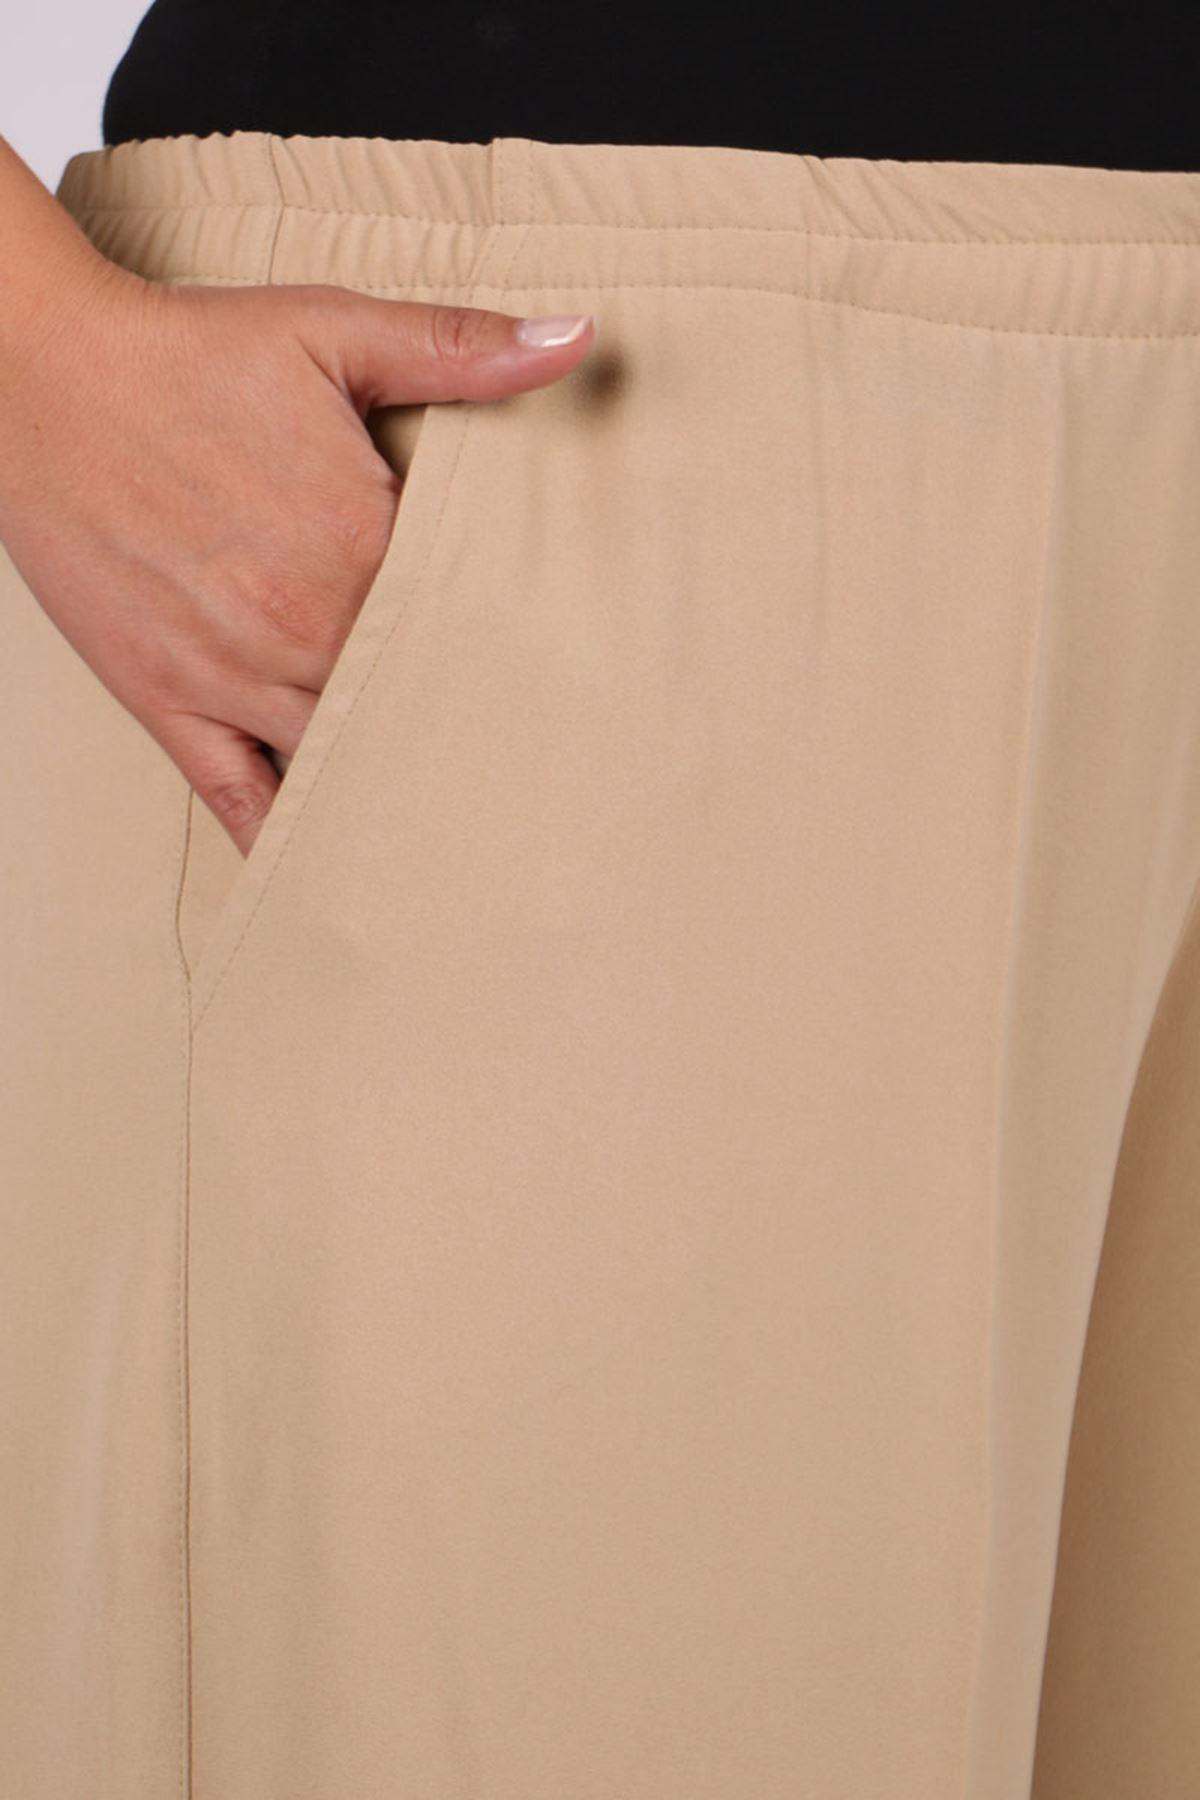 9171 Büyük Beden Beli Lastikli Çift Kat Krep Pantolon - Taş